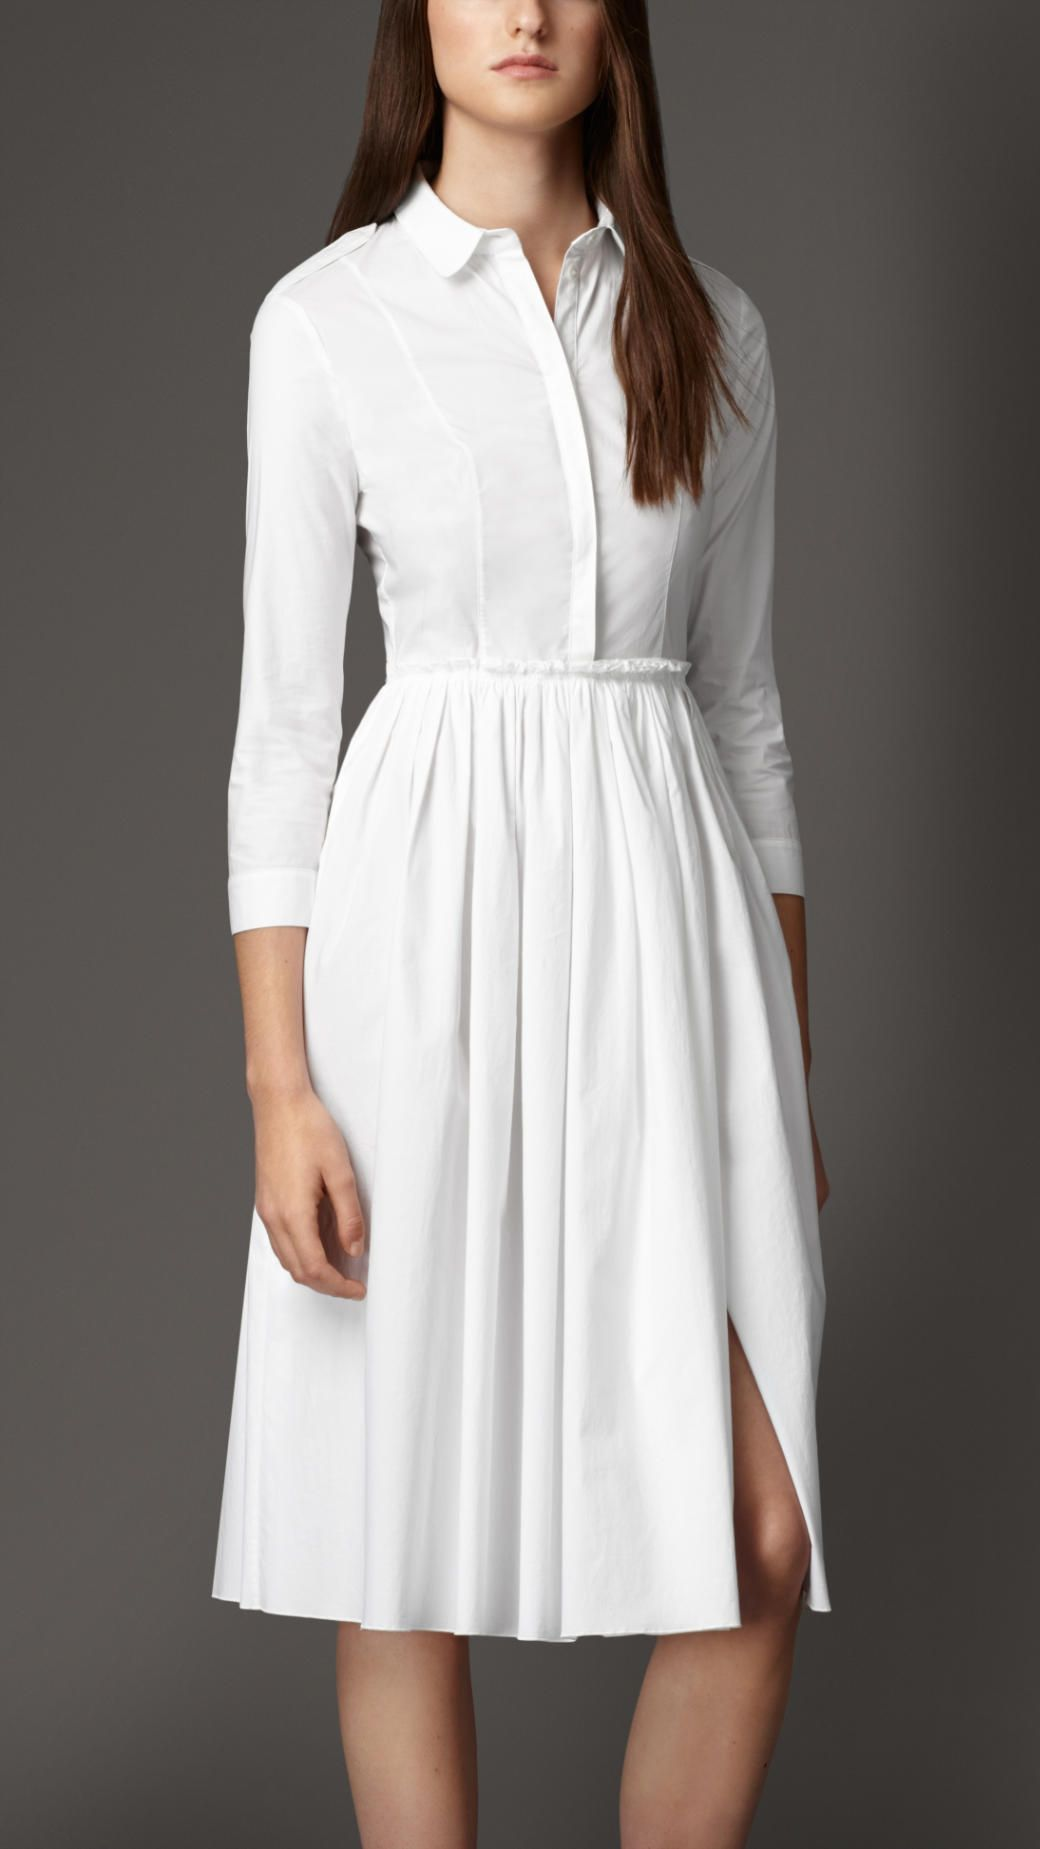 Petite robe droite en coton